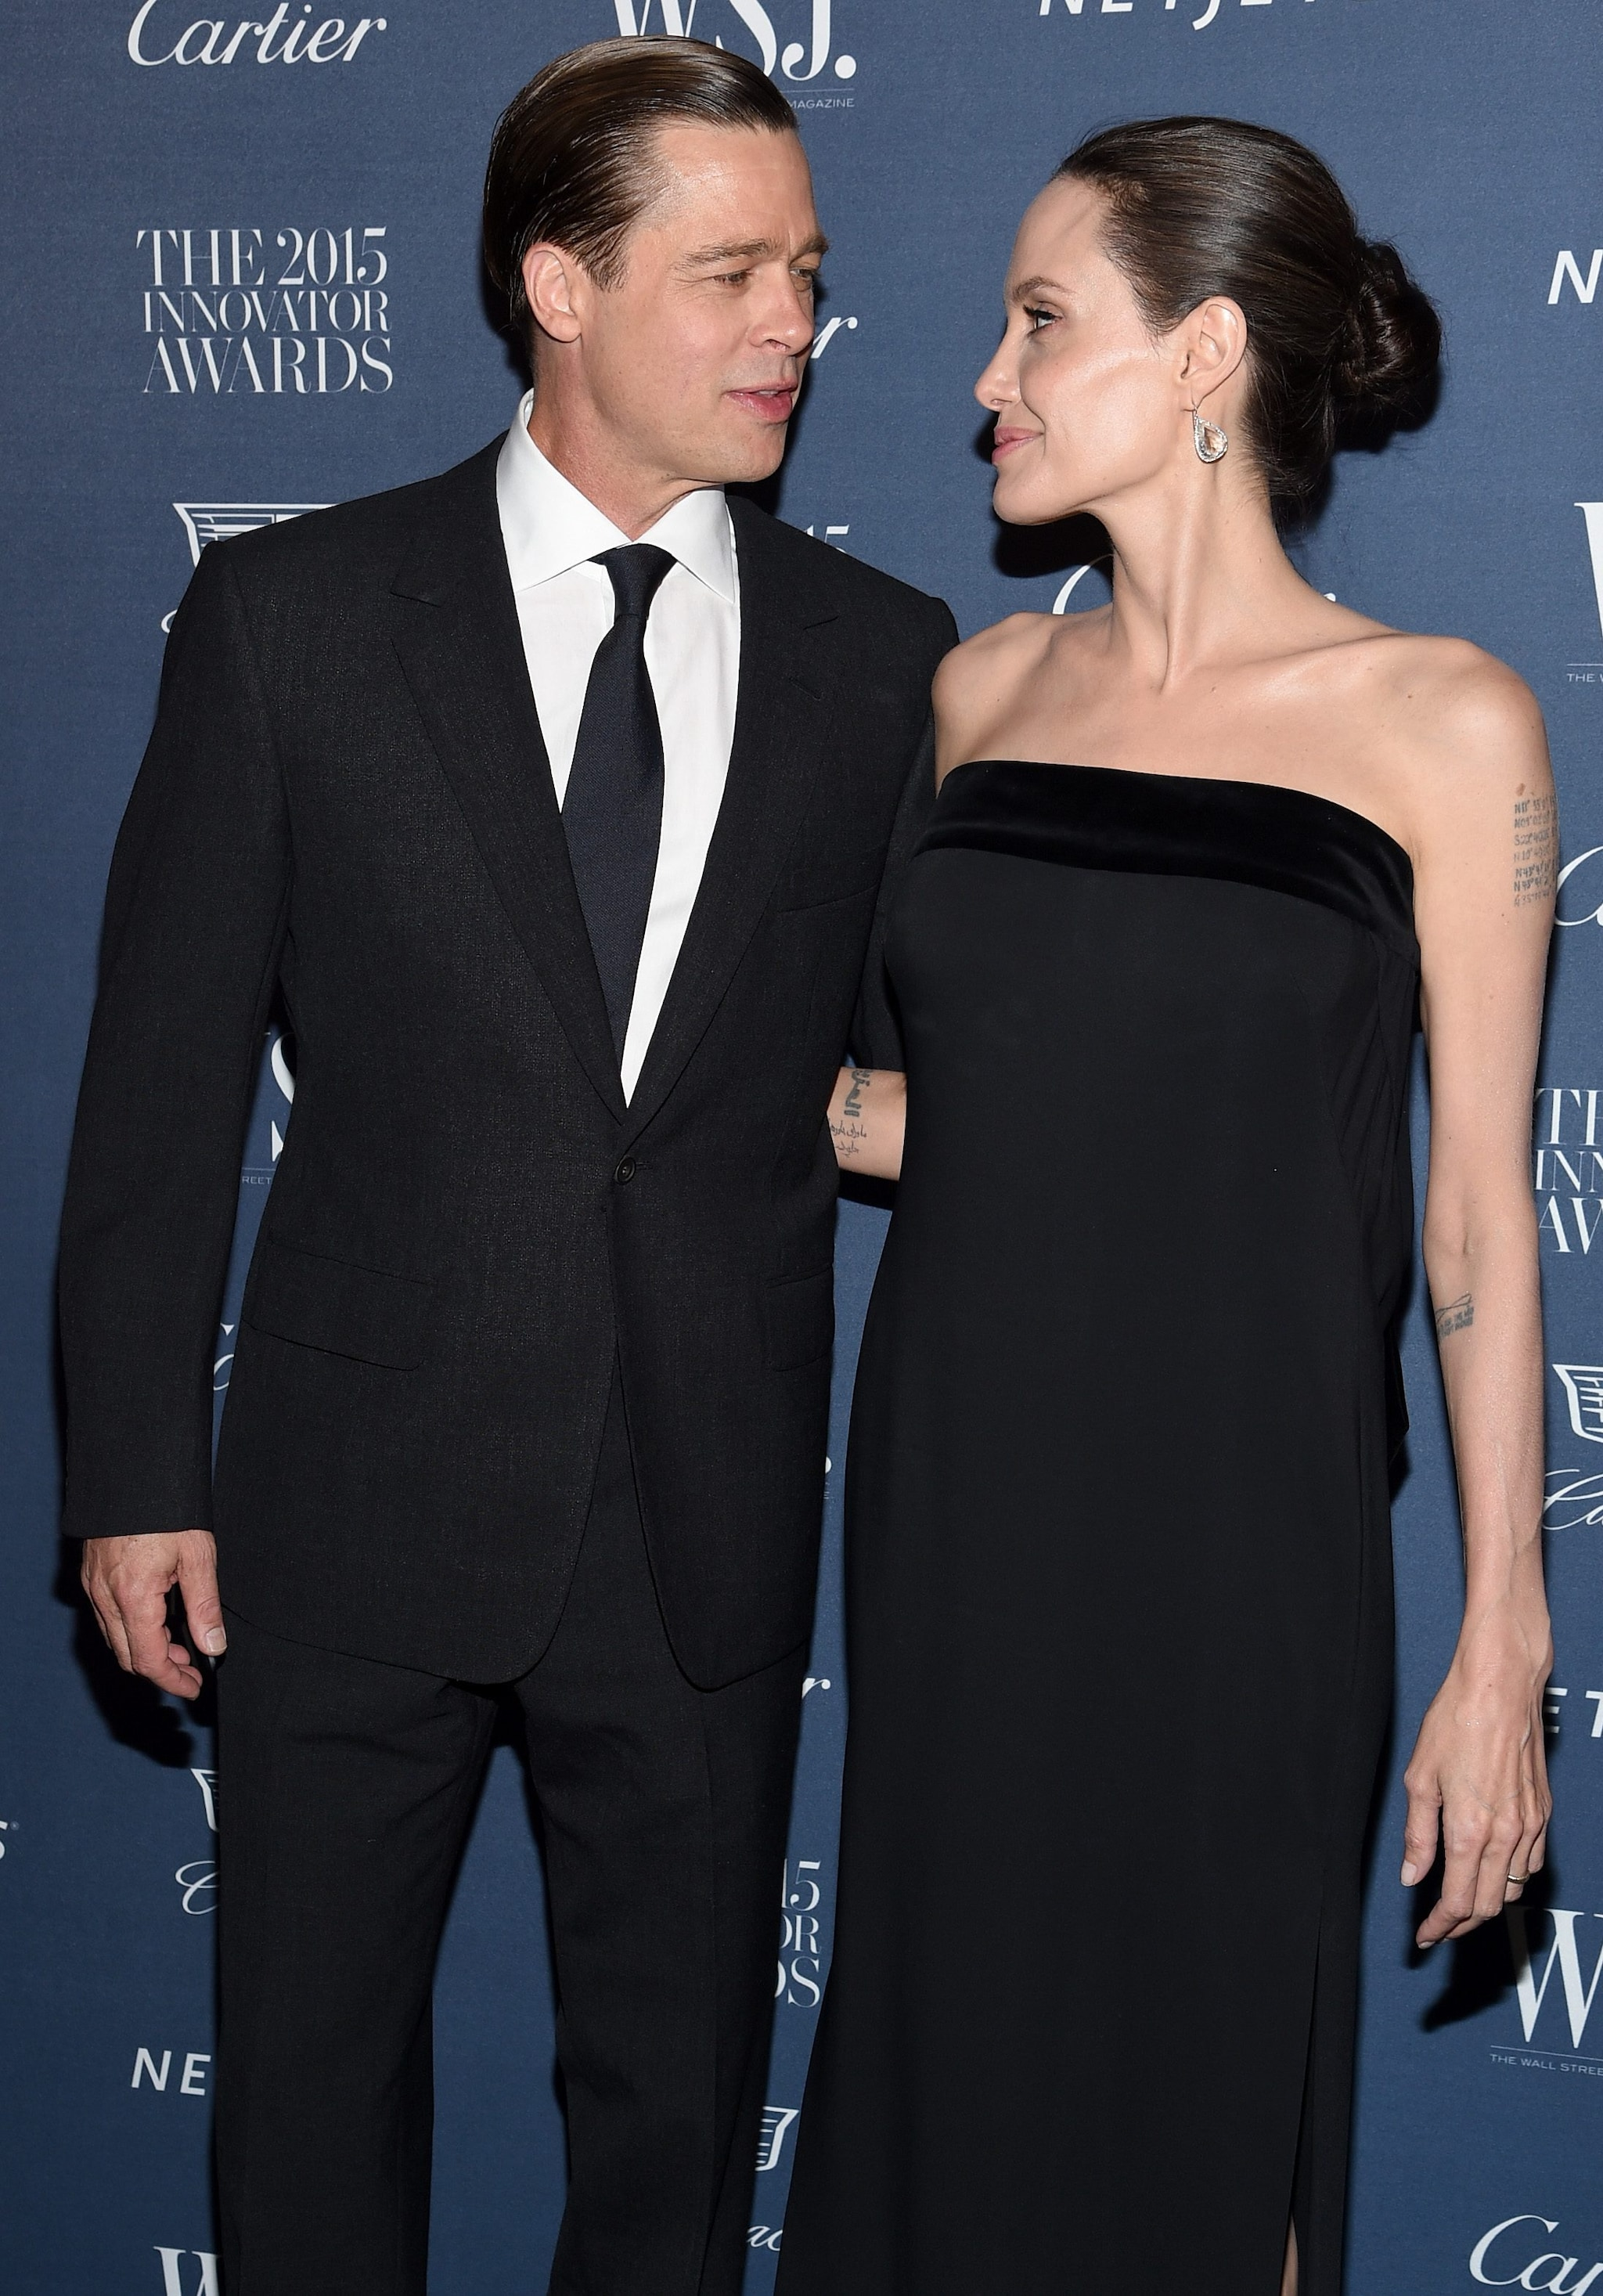 Brad Pitt e Angelina Jolie nel 2015